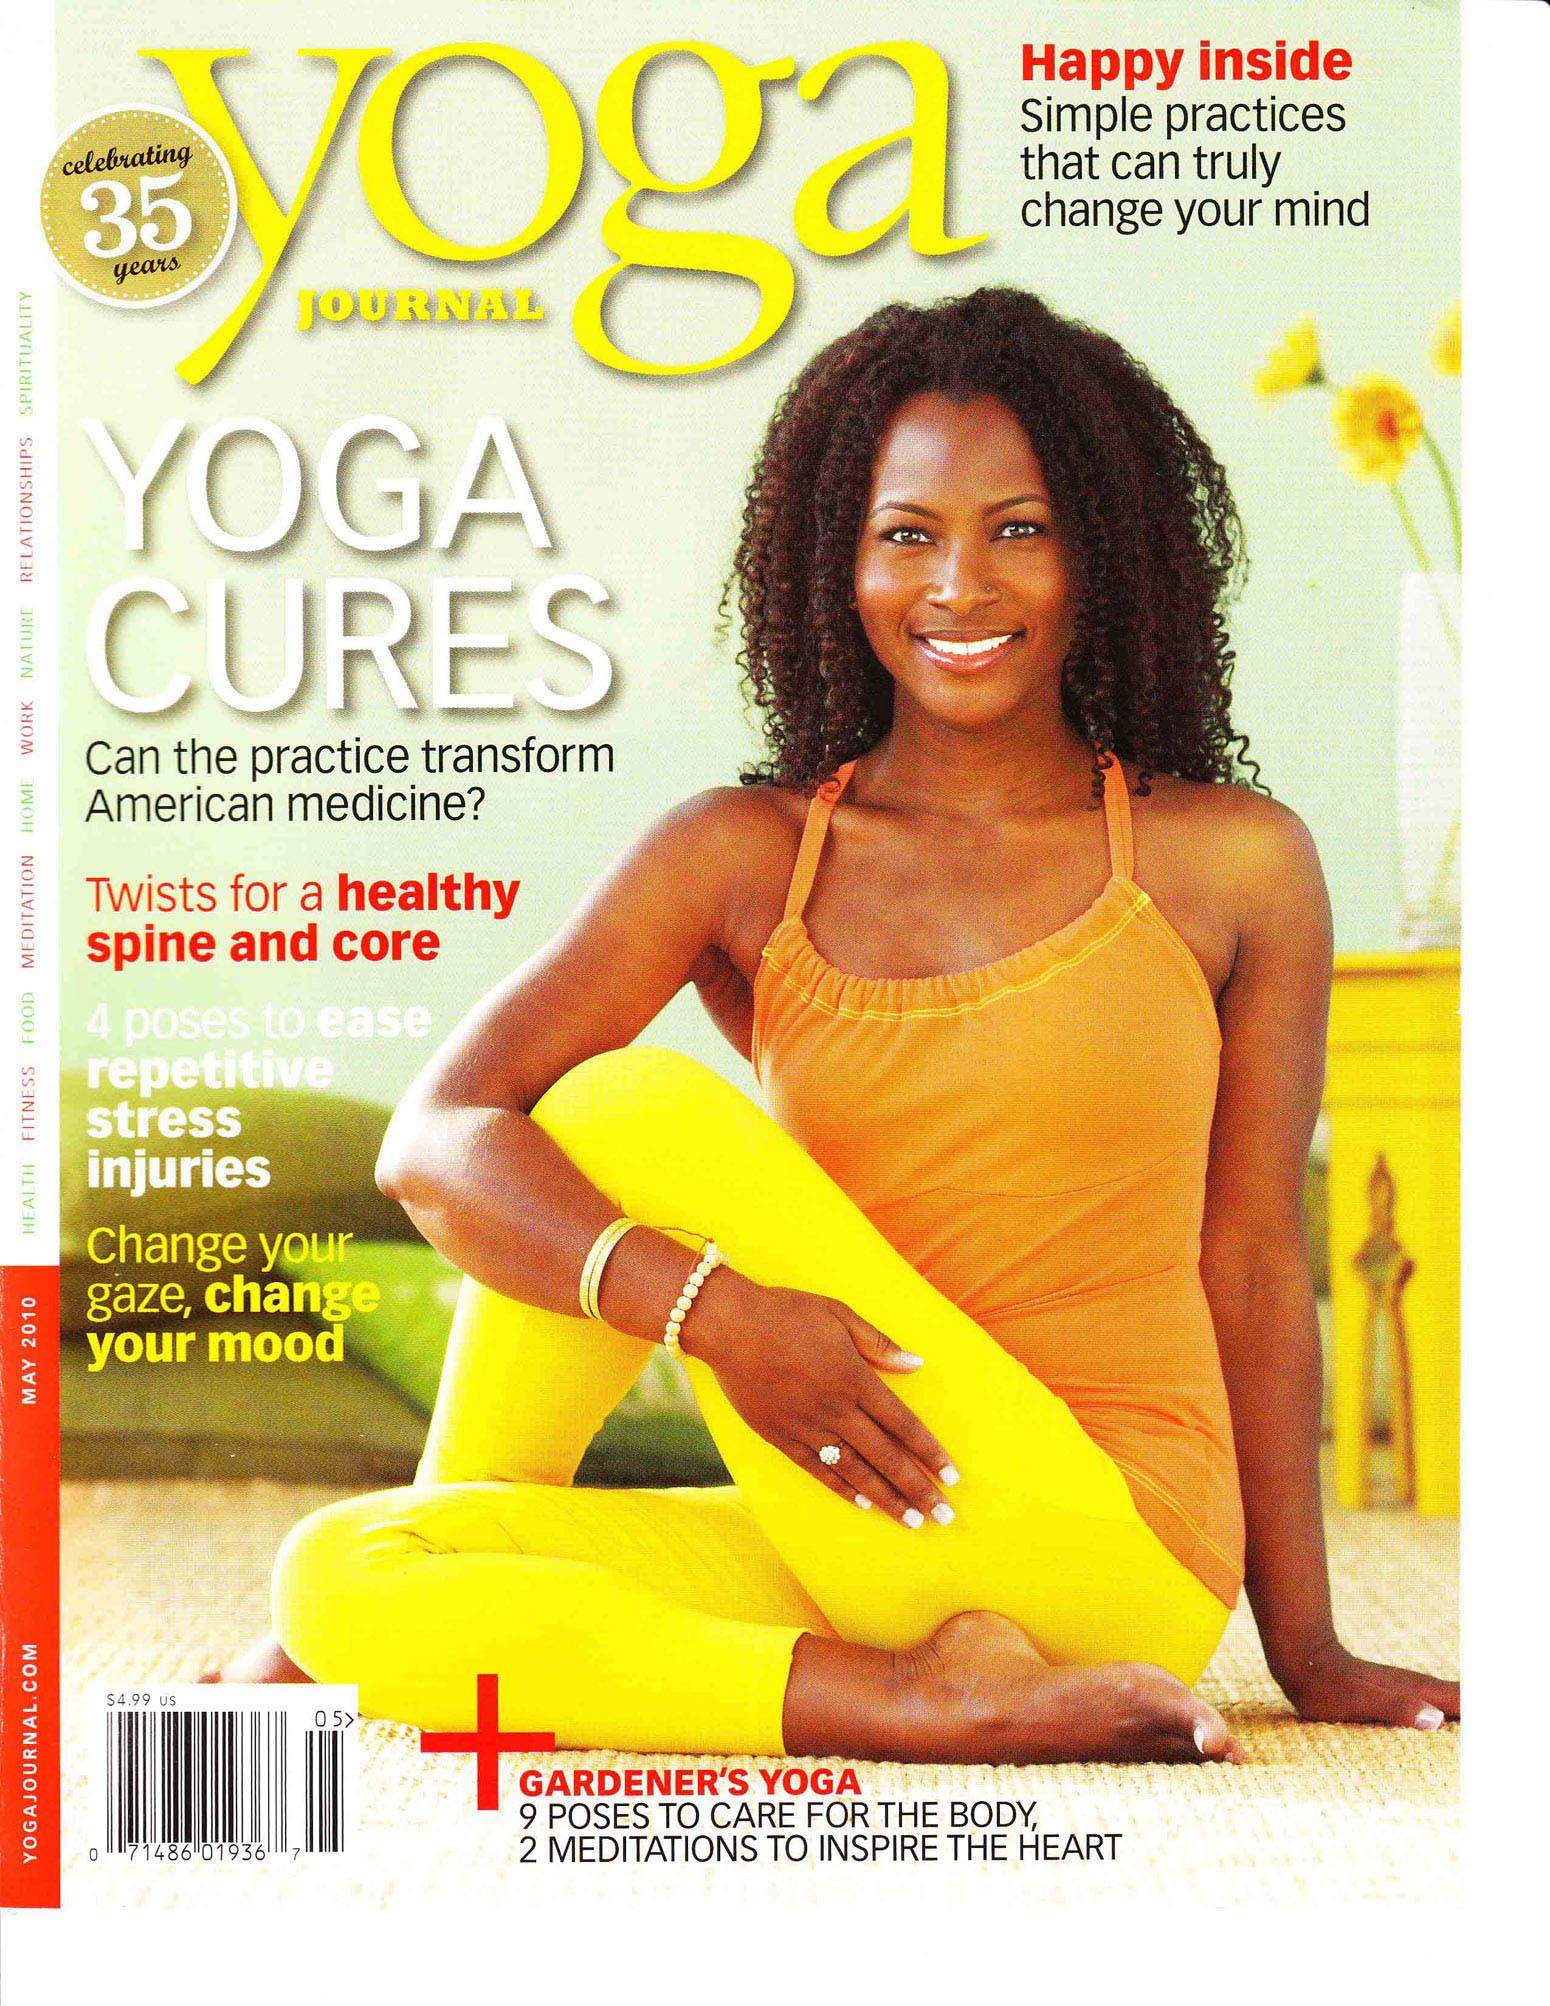 Free yoga classes online video